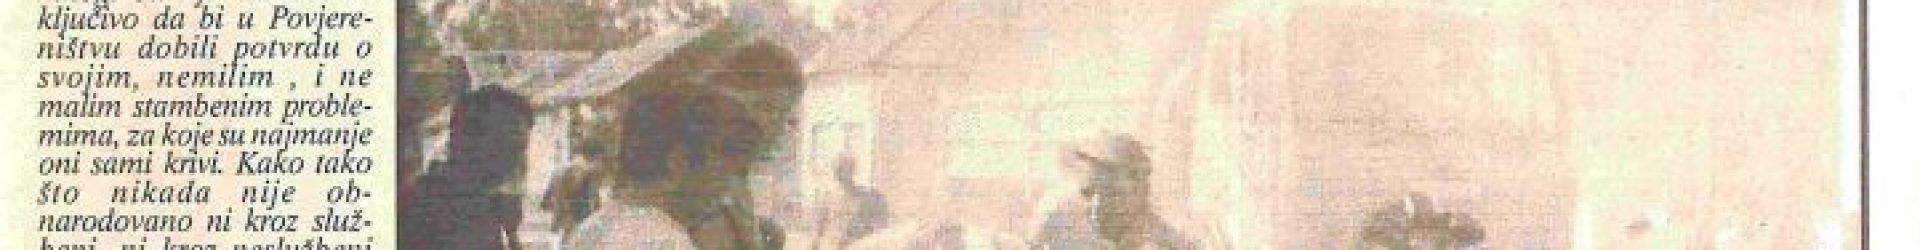 2019-03-11 13_28_05-Pakrački list broj 06. Datum 29.08.1992..pdf - Foxit Reader